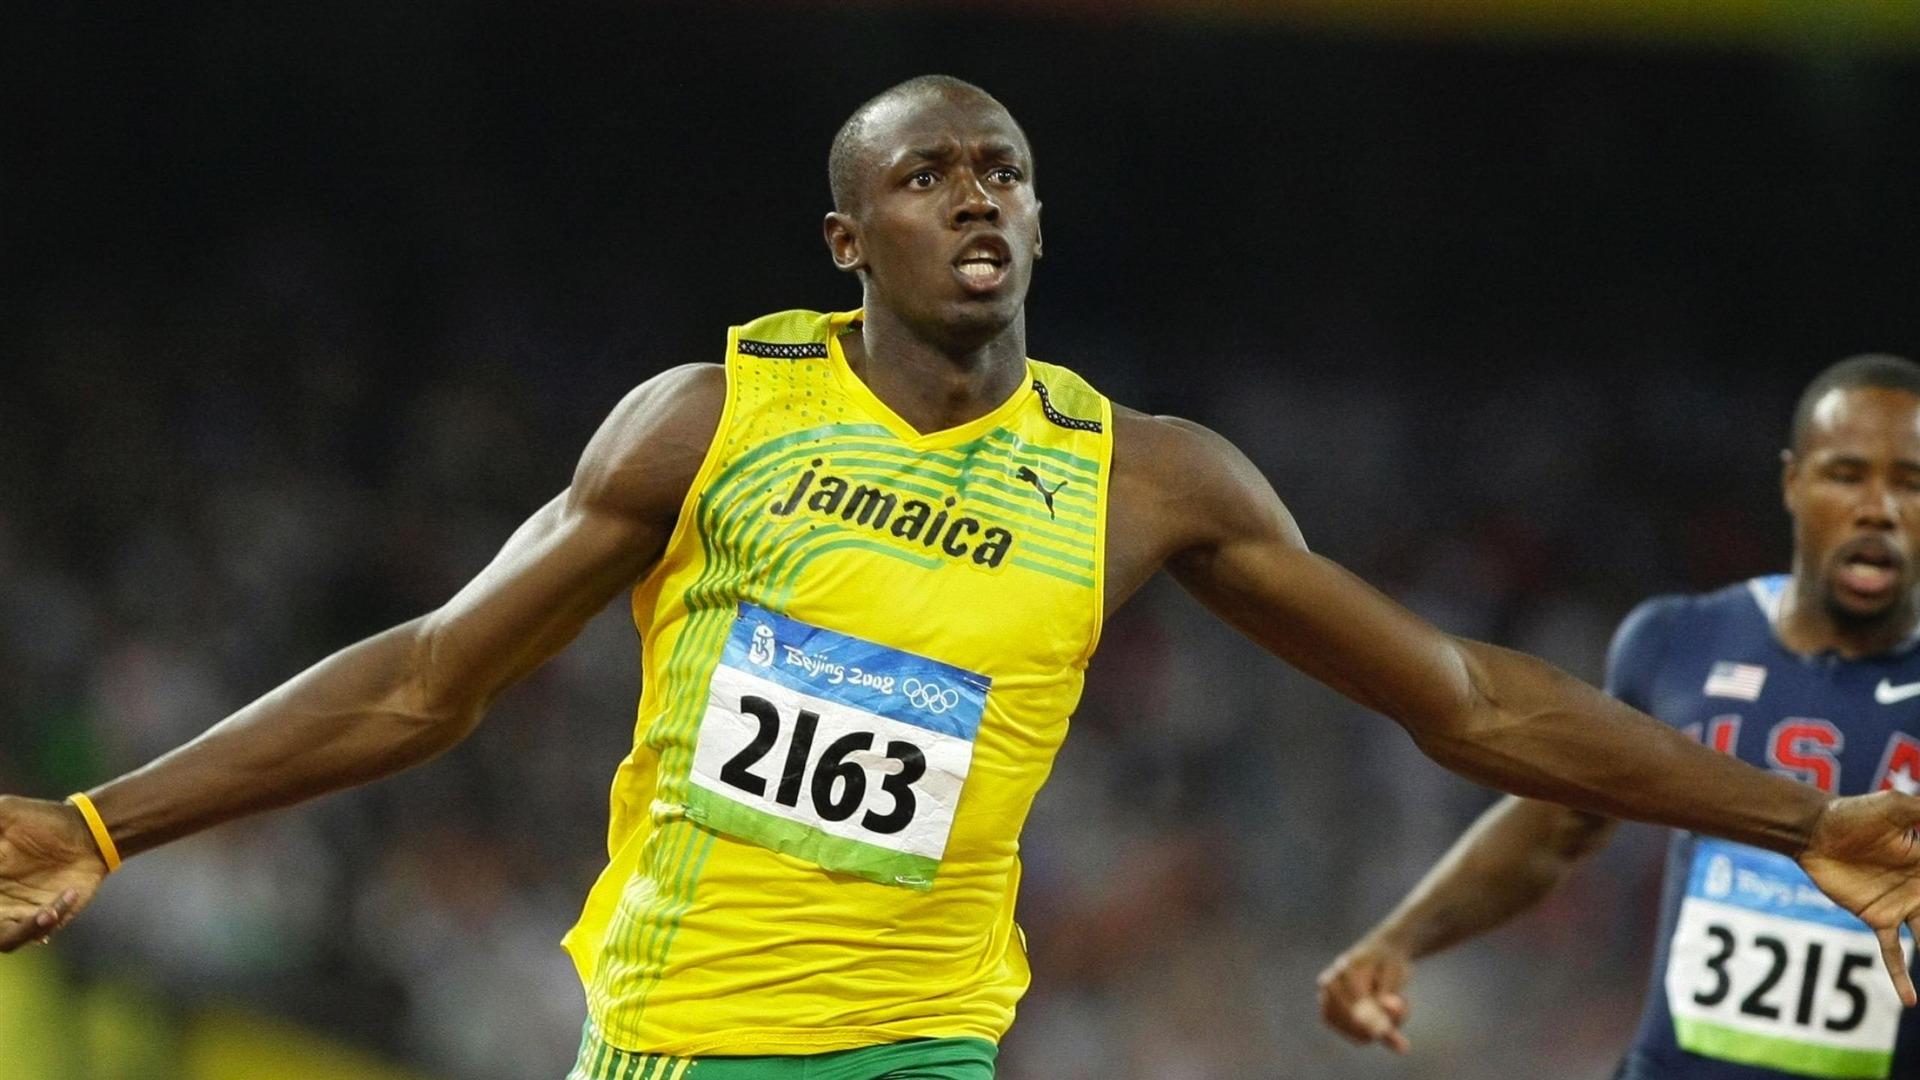 Usain Bolt-London 2012-1920x1080 Download | 10wallpaper.com